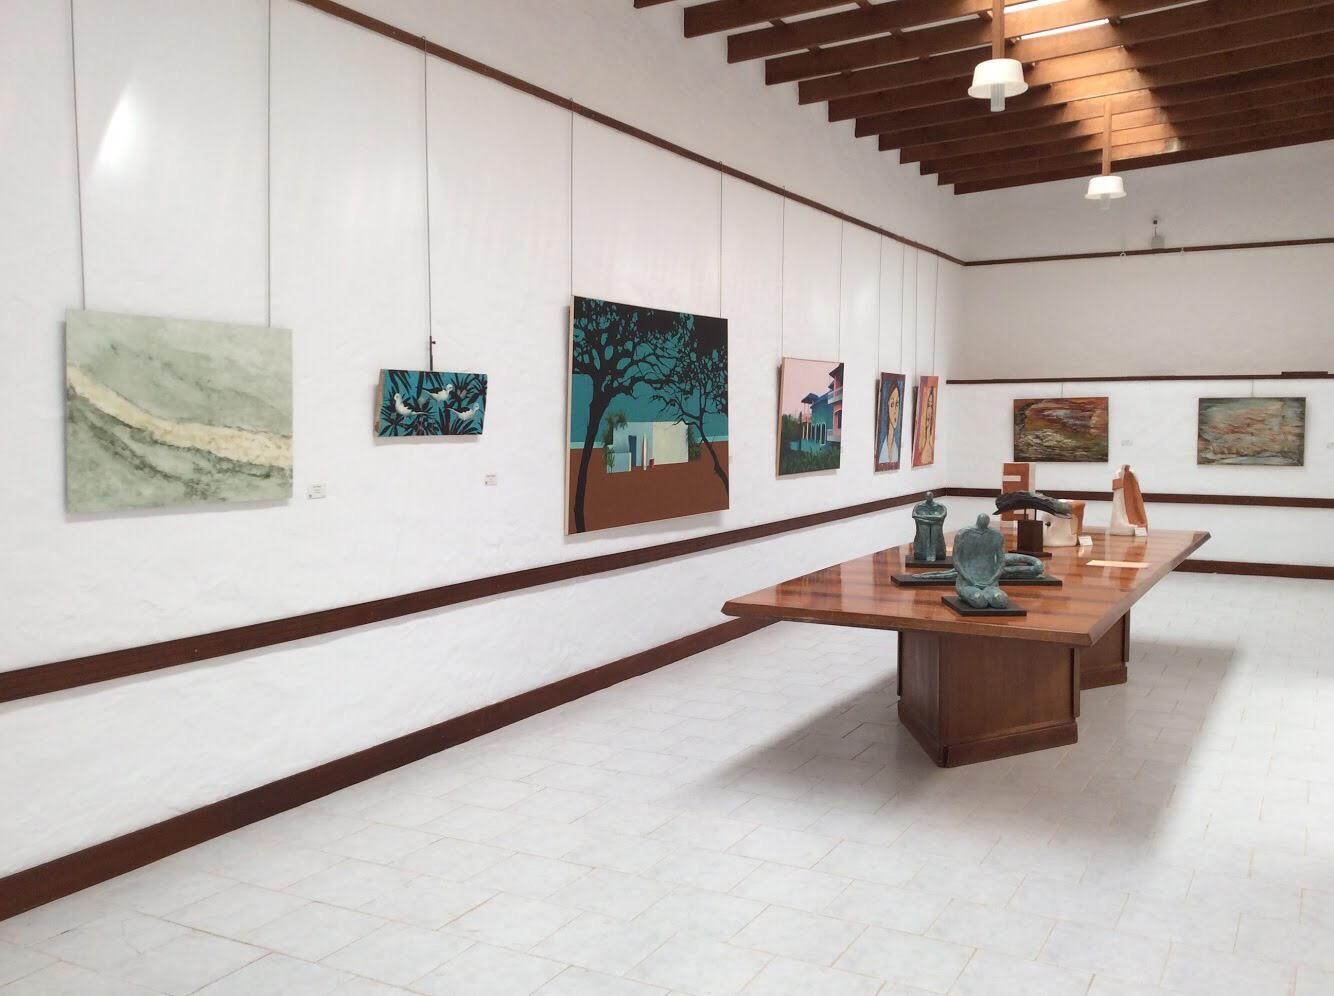 Centro de Arte Casa Mané